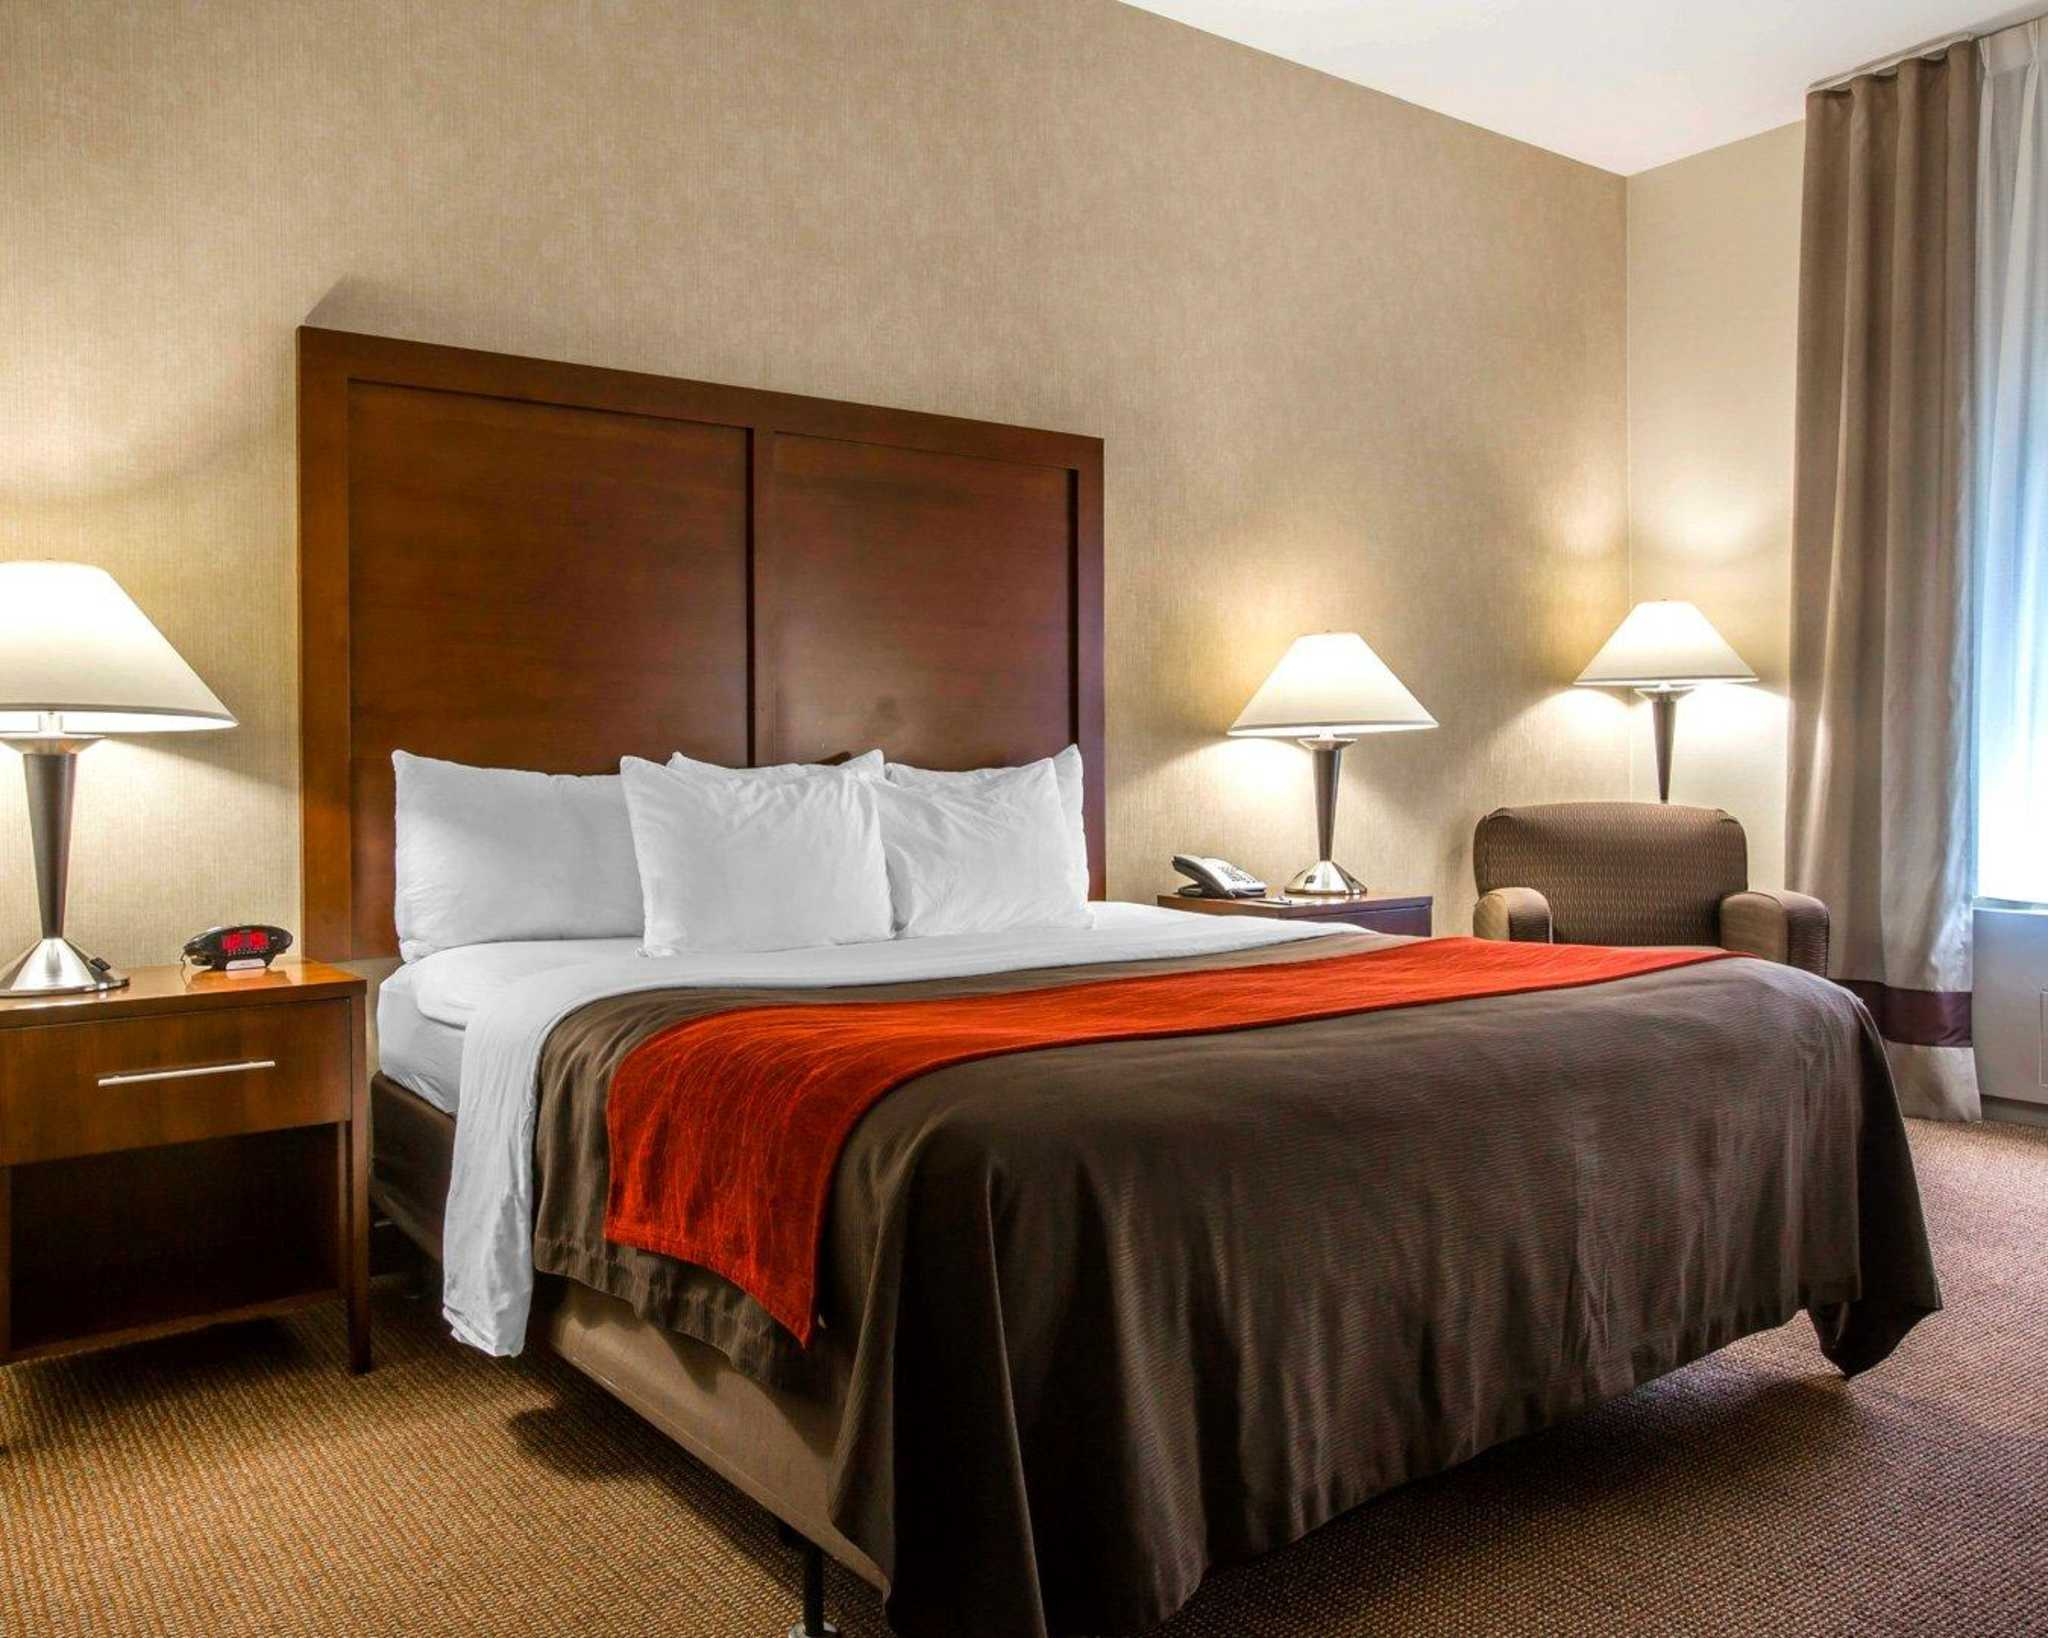 Comfort Inn & Suites adj to Akwesasne Mohawk Casino image 4